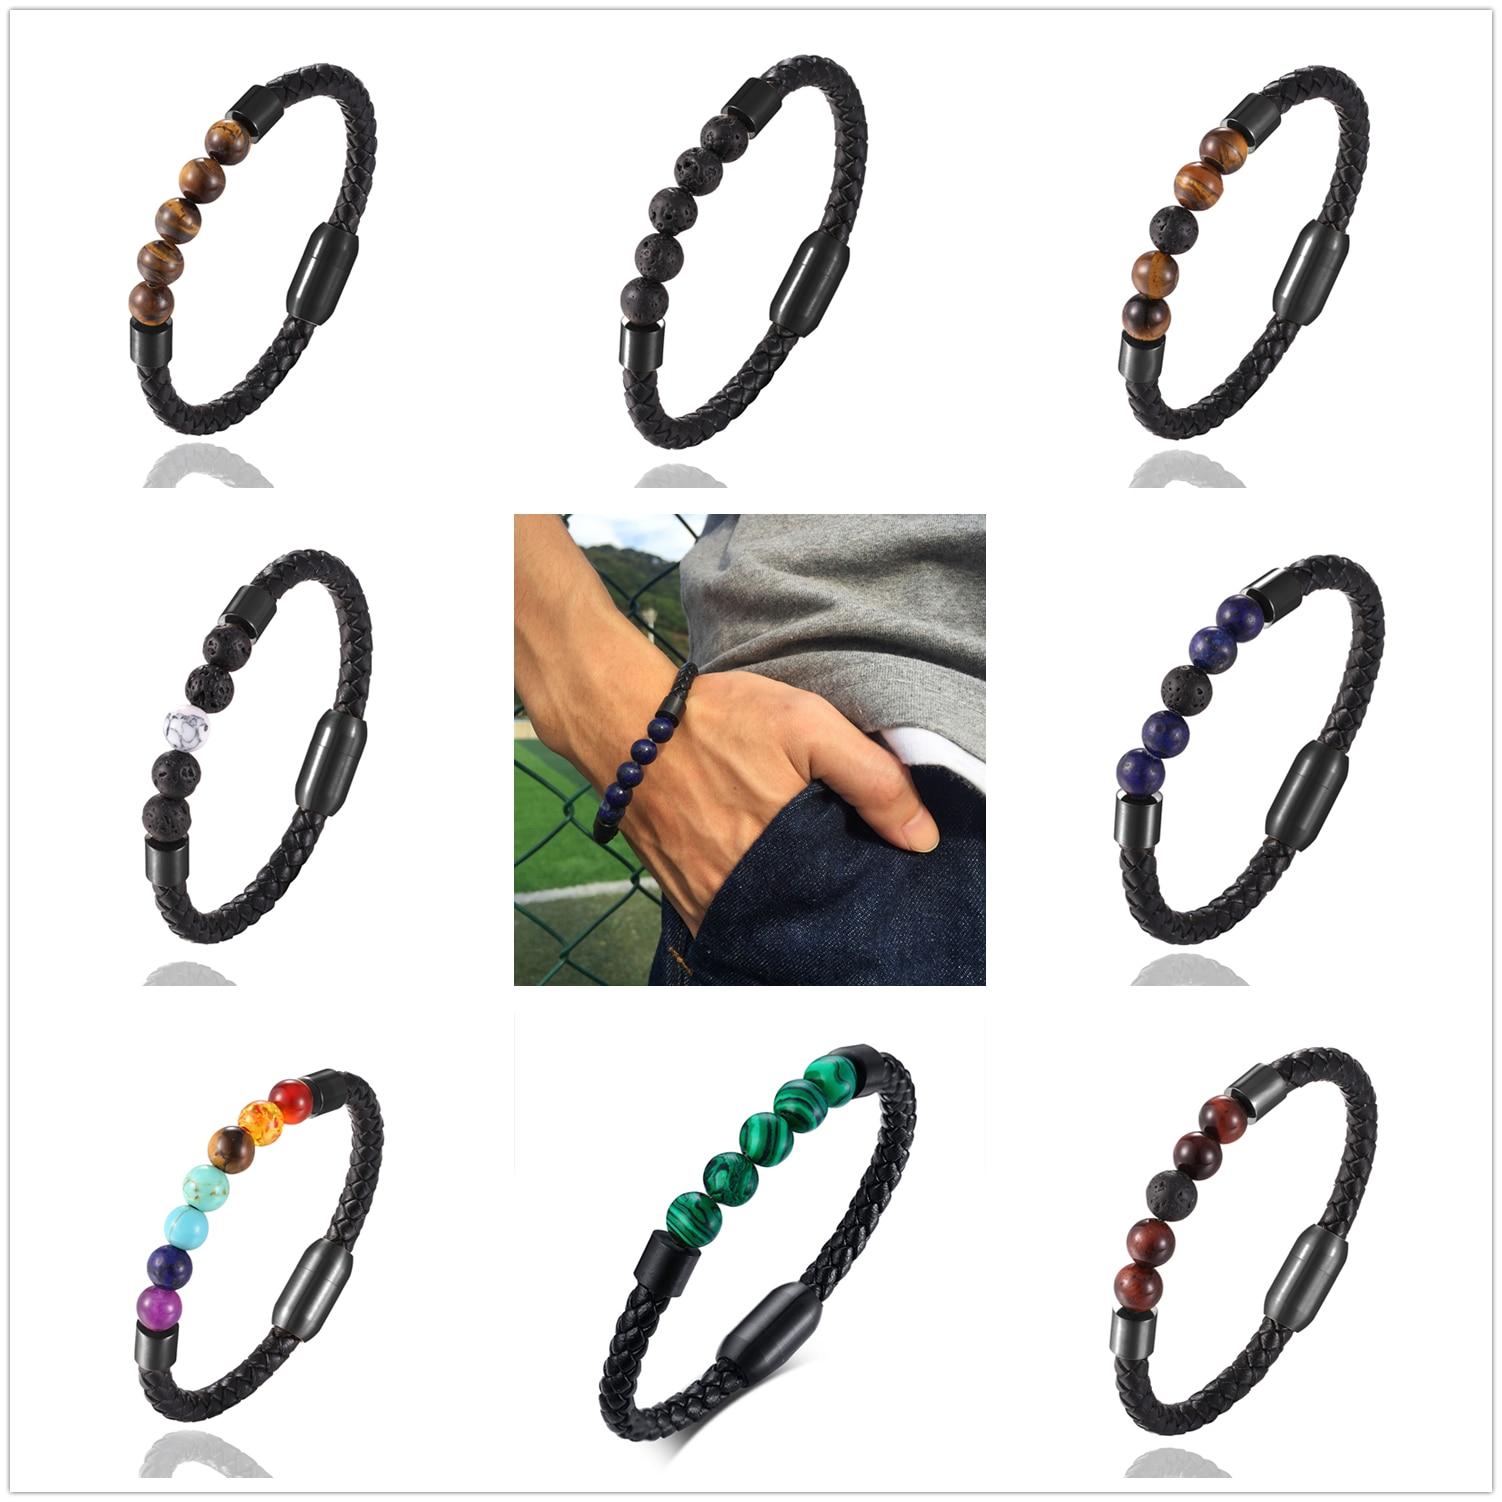 2020 New Fashion Charm Male Leather Bracelet Lava Chakra Stone Beads Black Stainless Bracelets & Bangles for Men Punk Jewelry